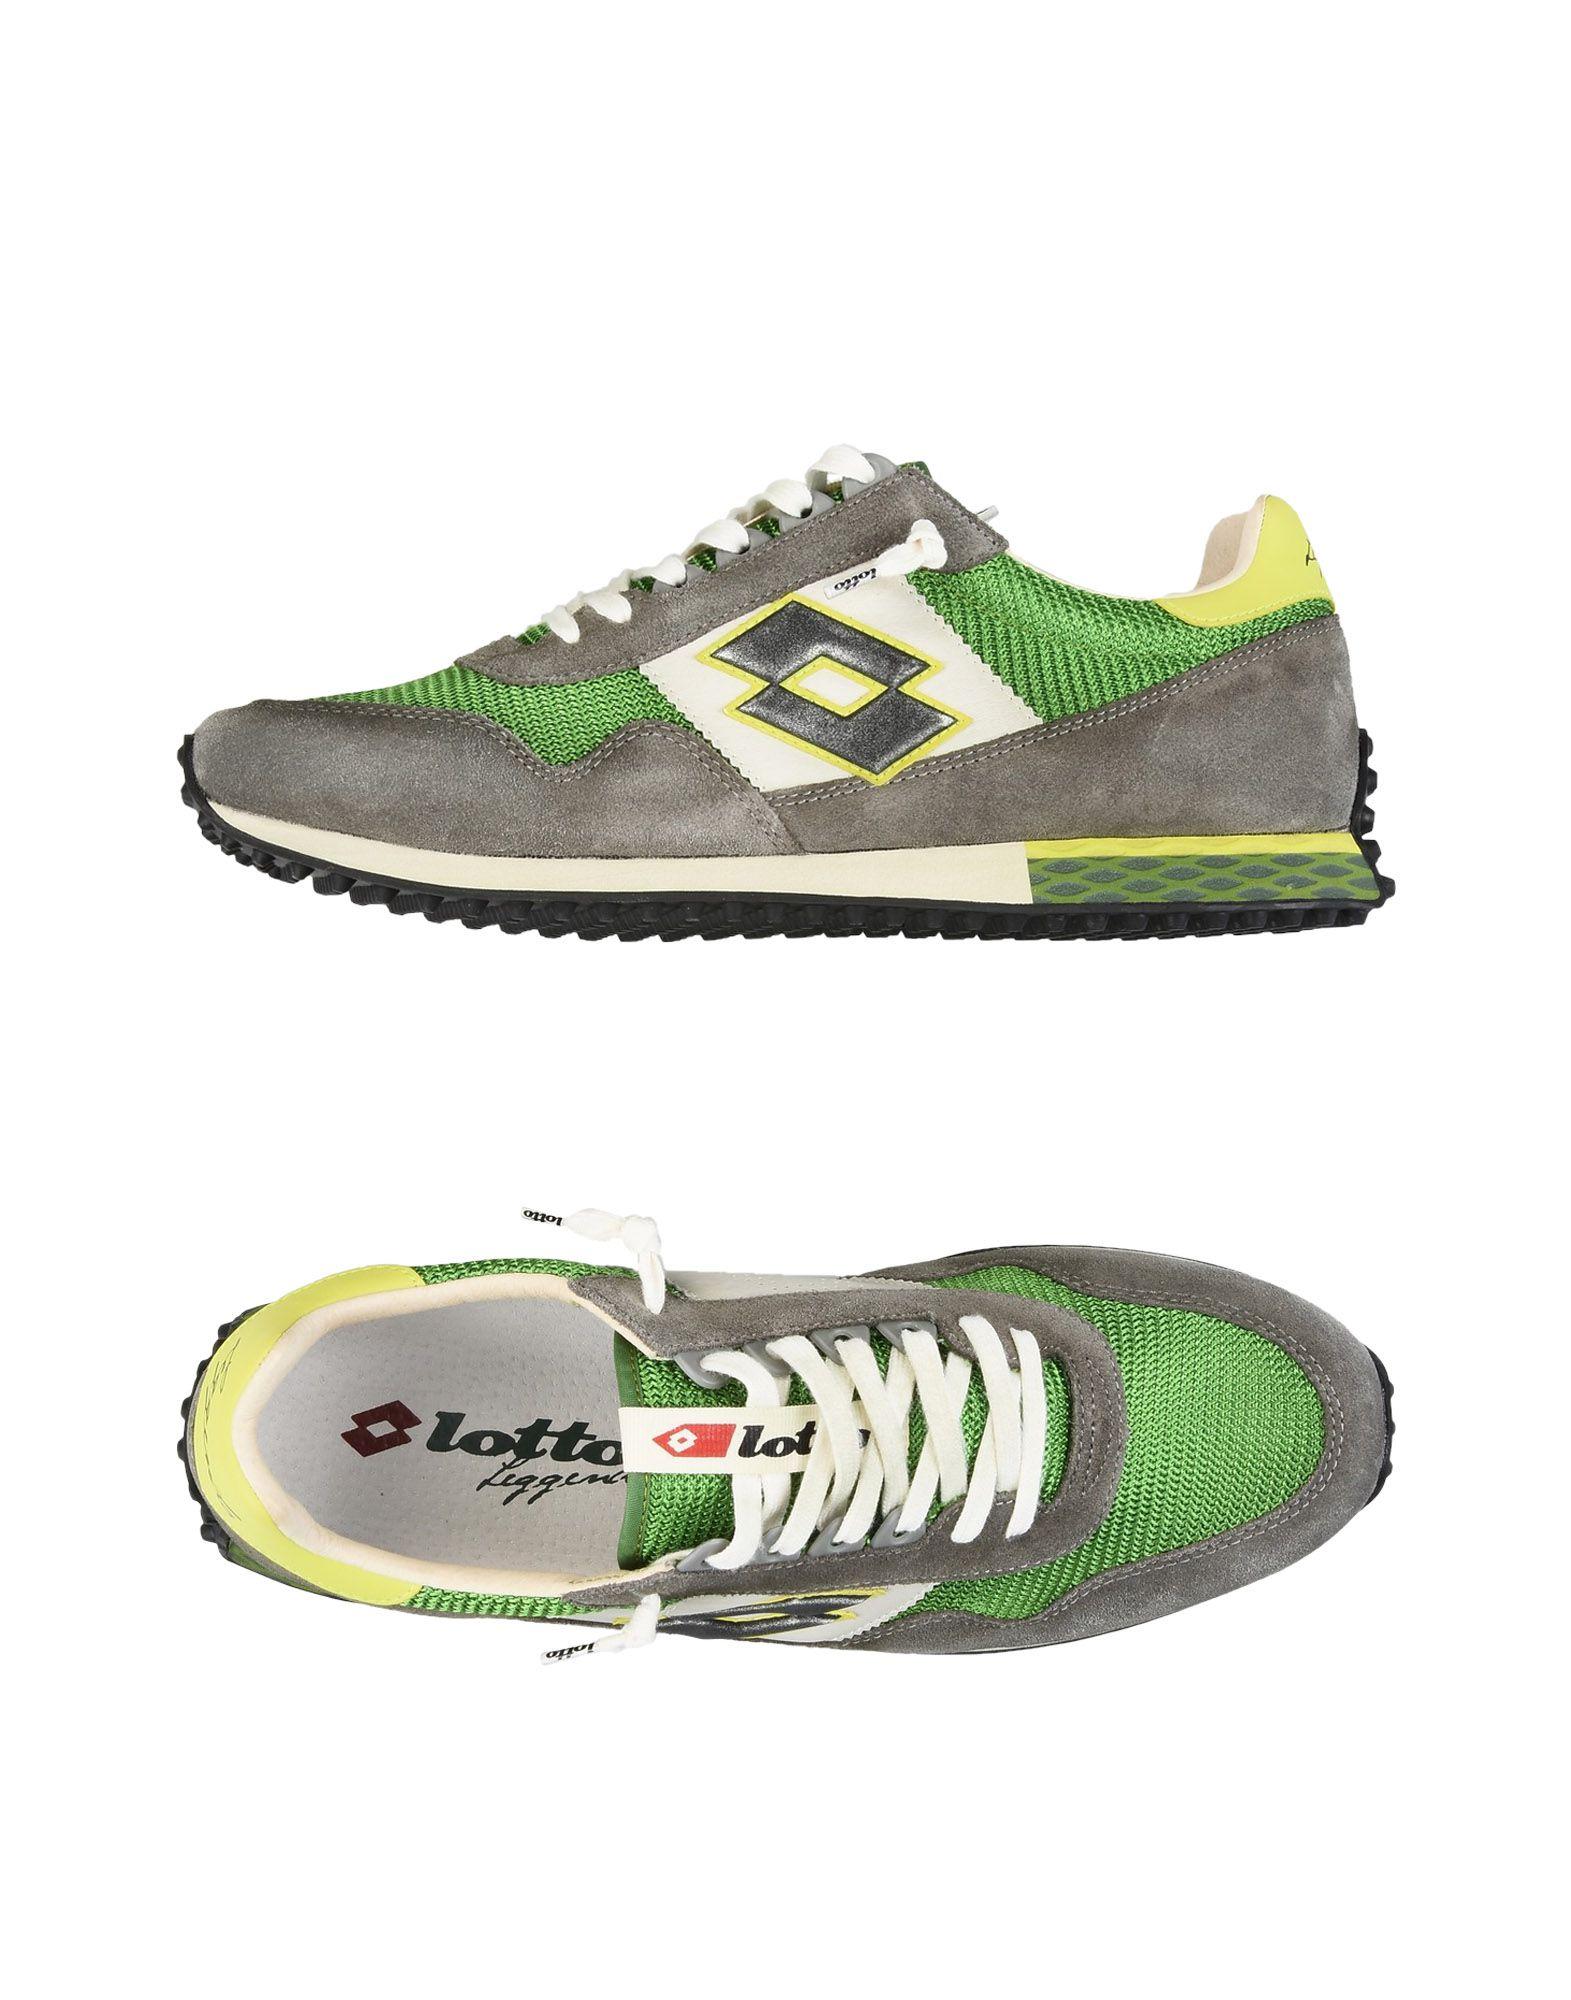 Lotto Leggenda  Tokyo Targa  11221956KK Gute Qualität beliebte Schuhe